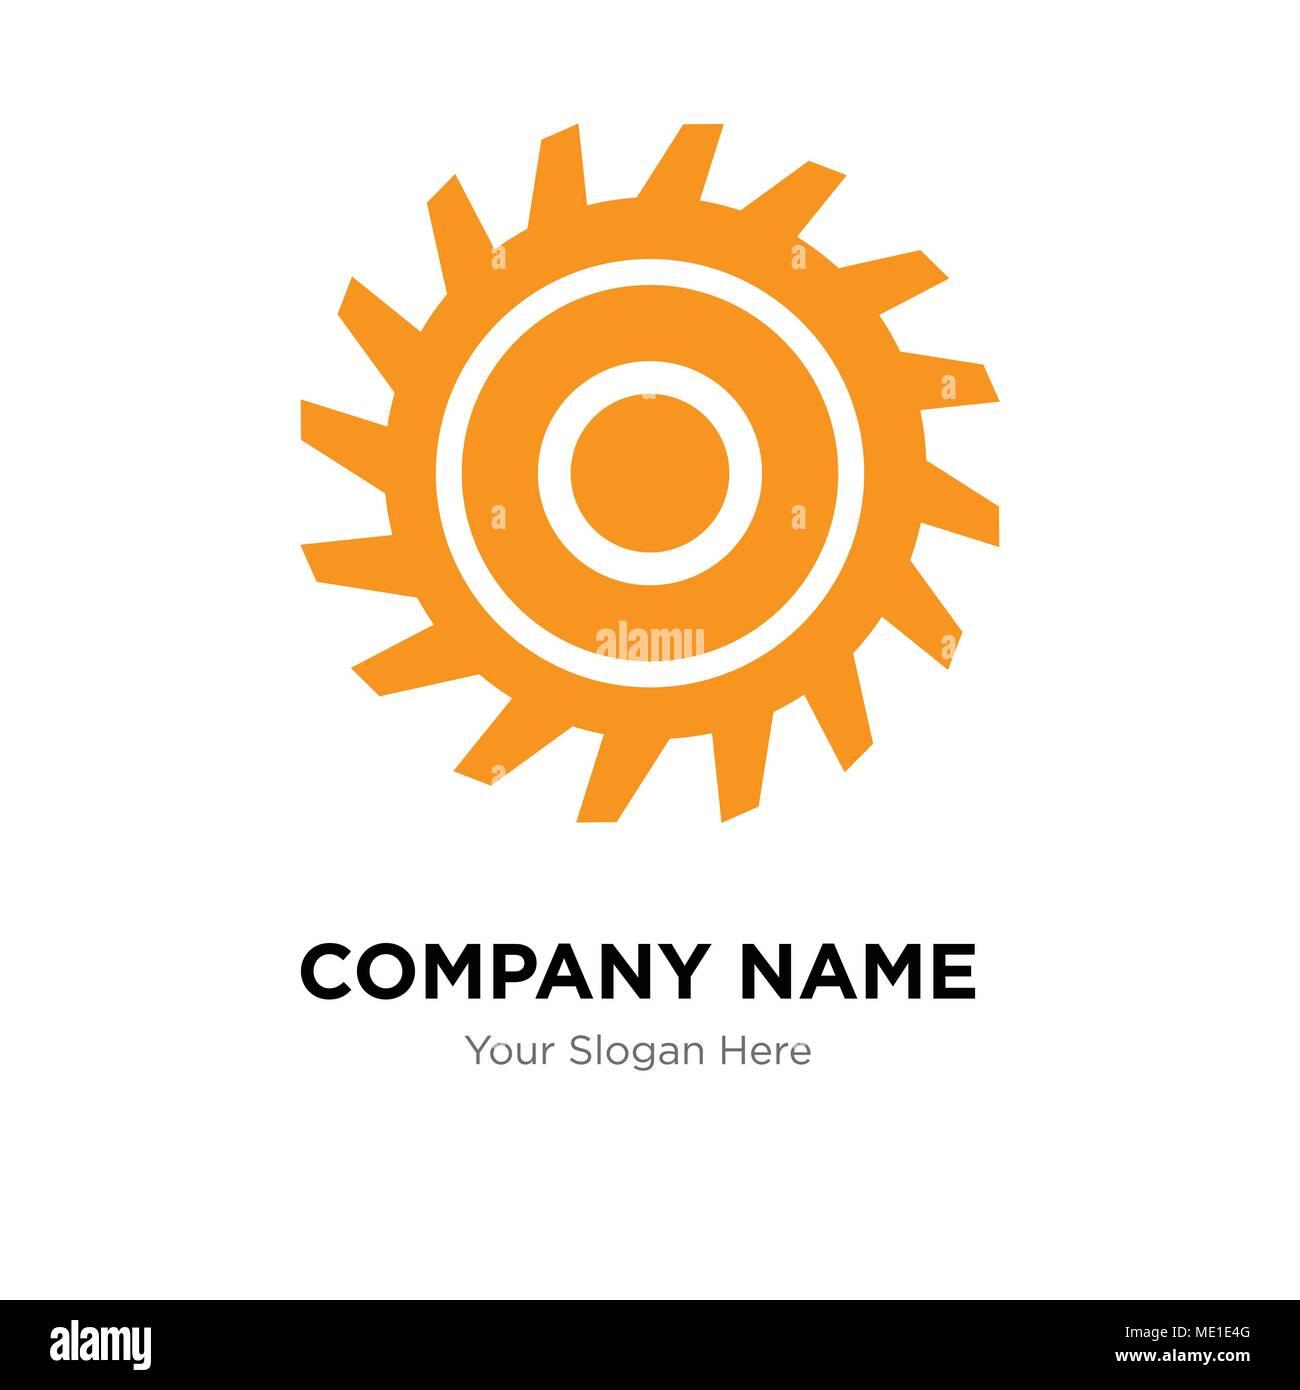 saw blade company logo design template business corporate vector